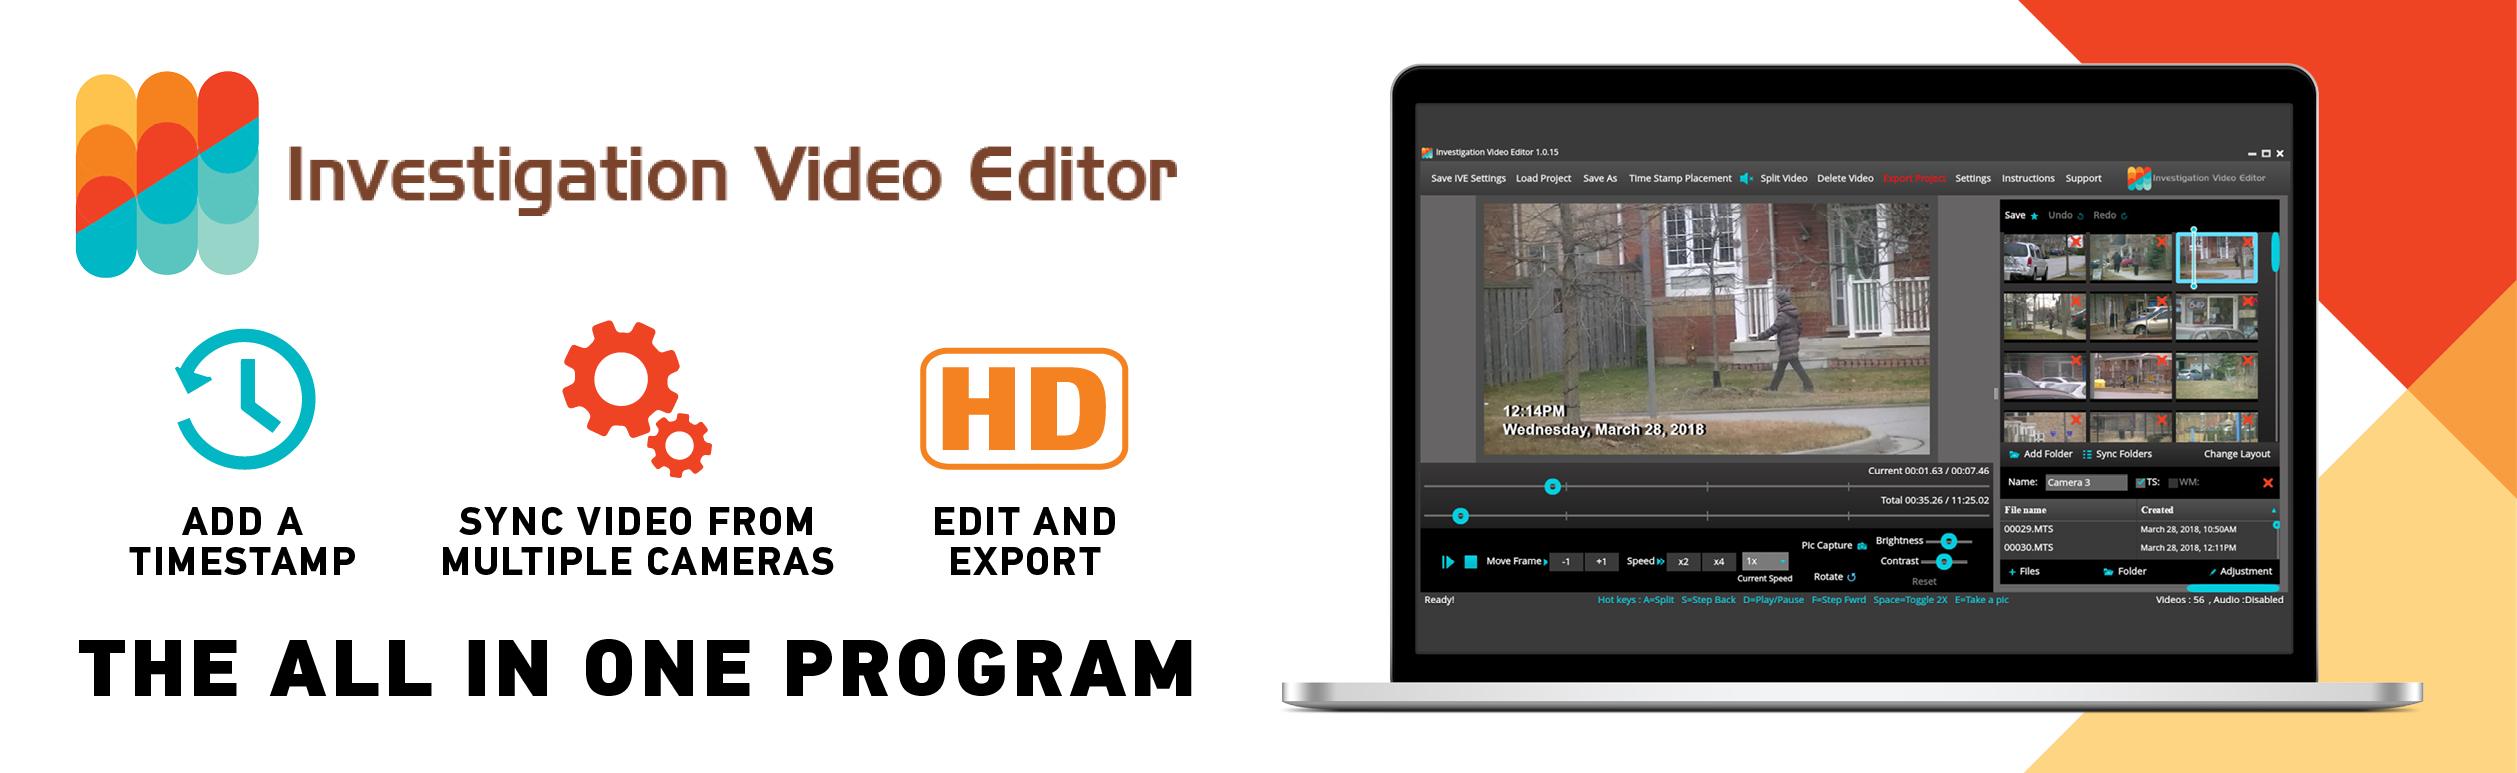 INVEST  VIDEO EDITOR